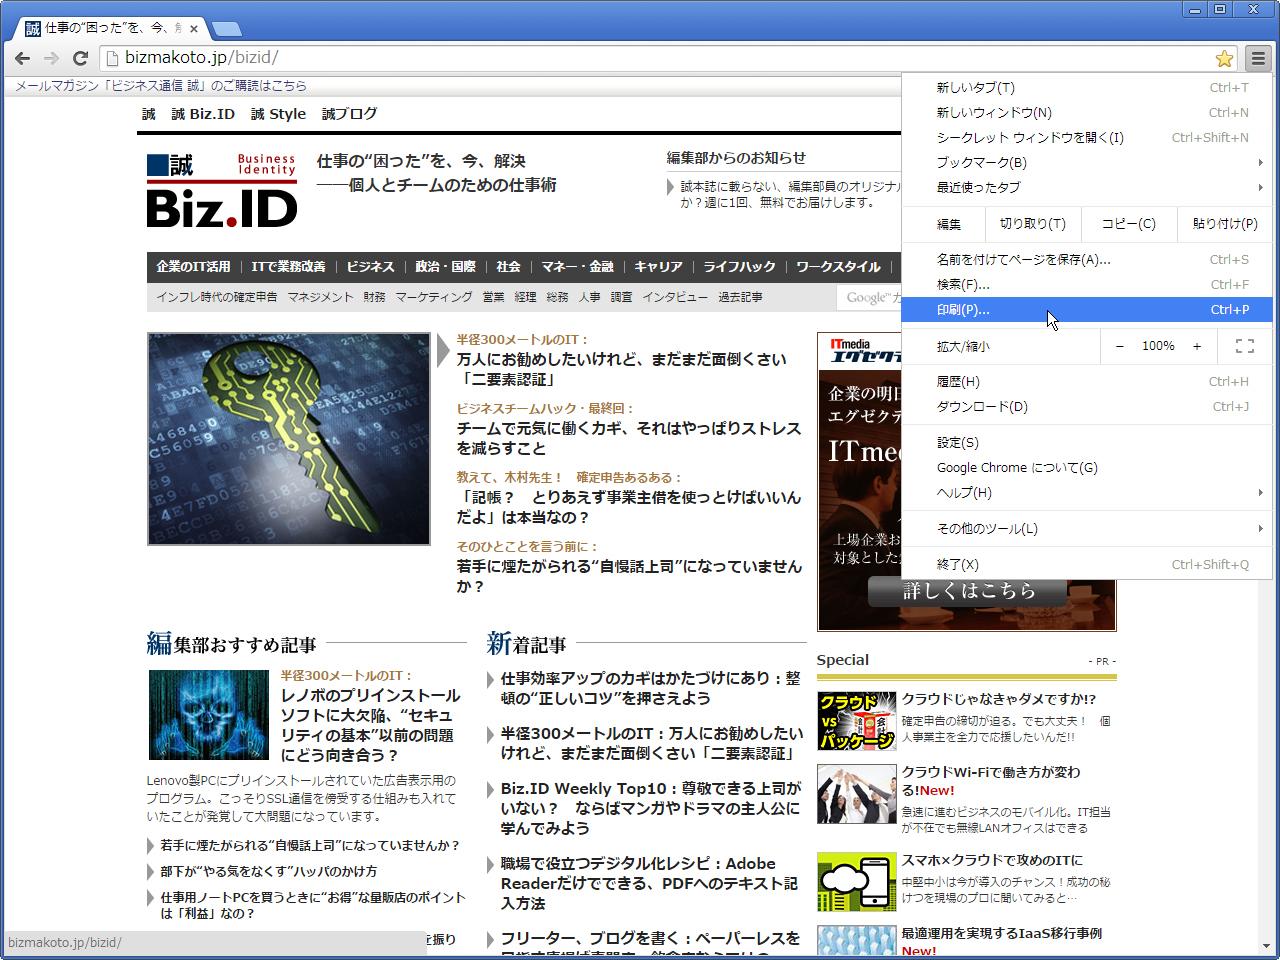 webページ全体 pdf 保存